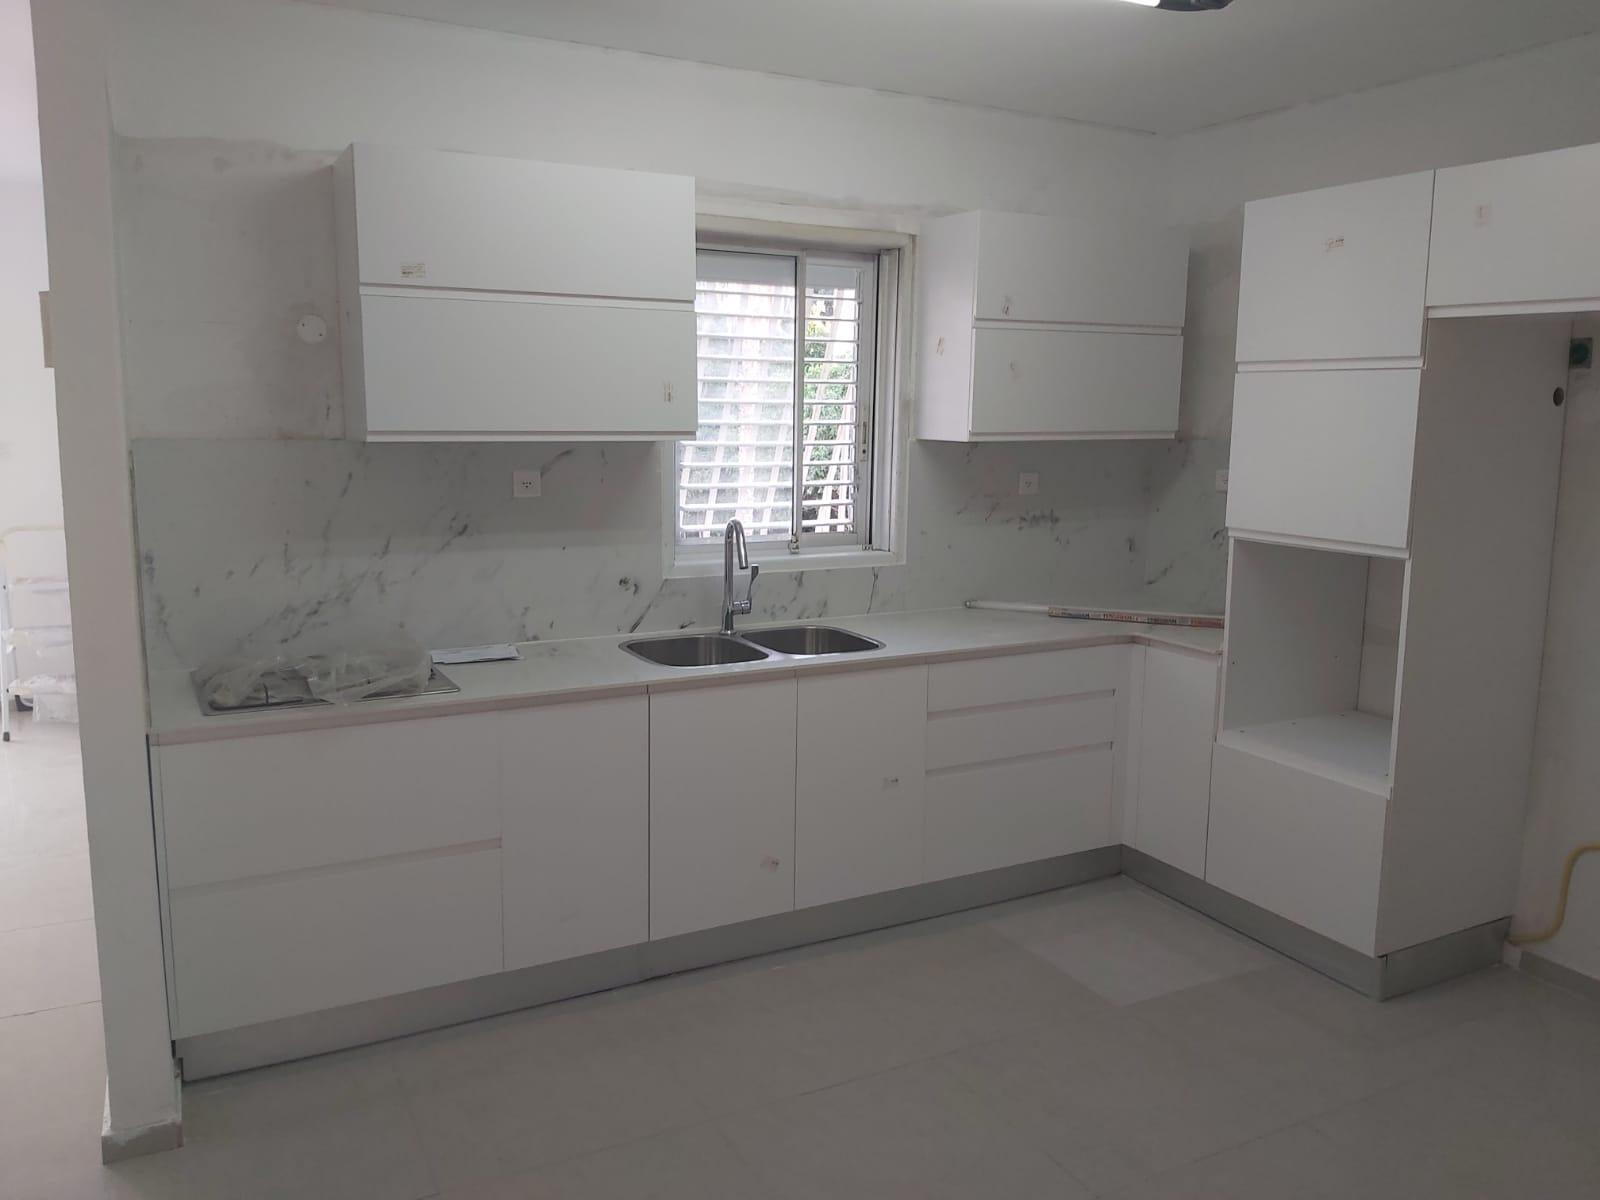 For sale, Tel Aviv, Neve Eliezer, 4 rooms, balcony, storage, parking